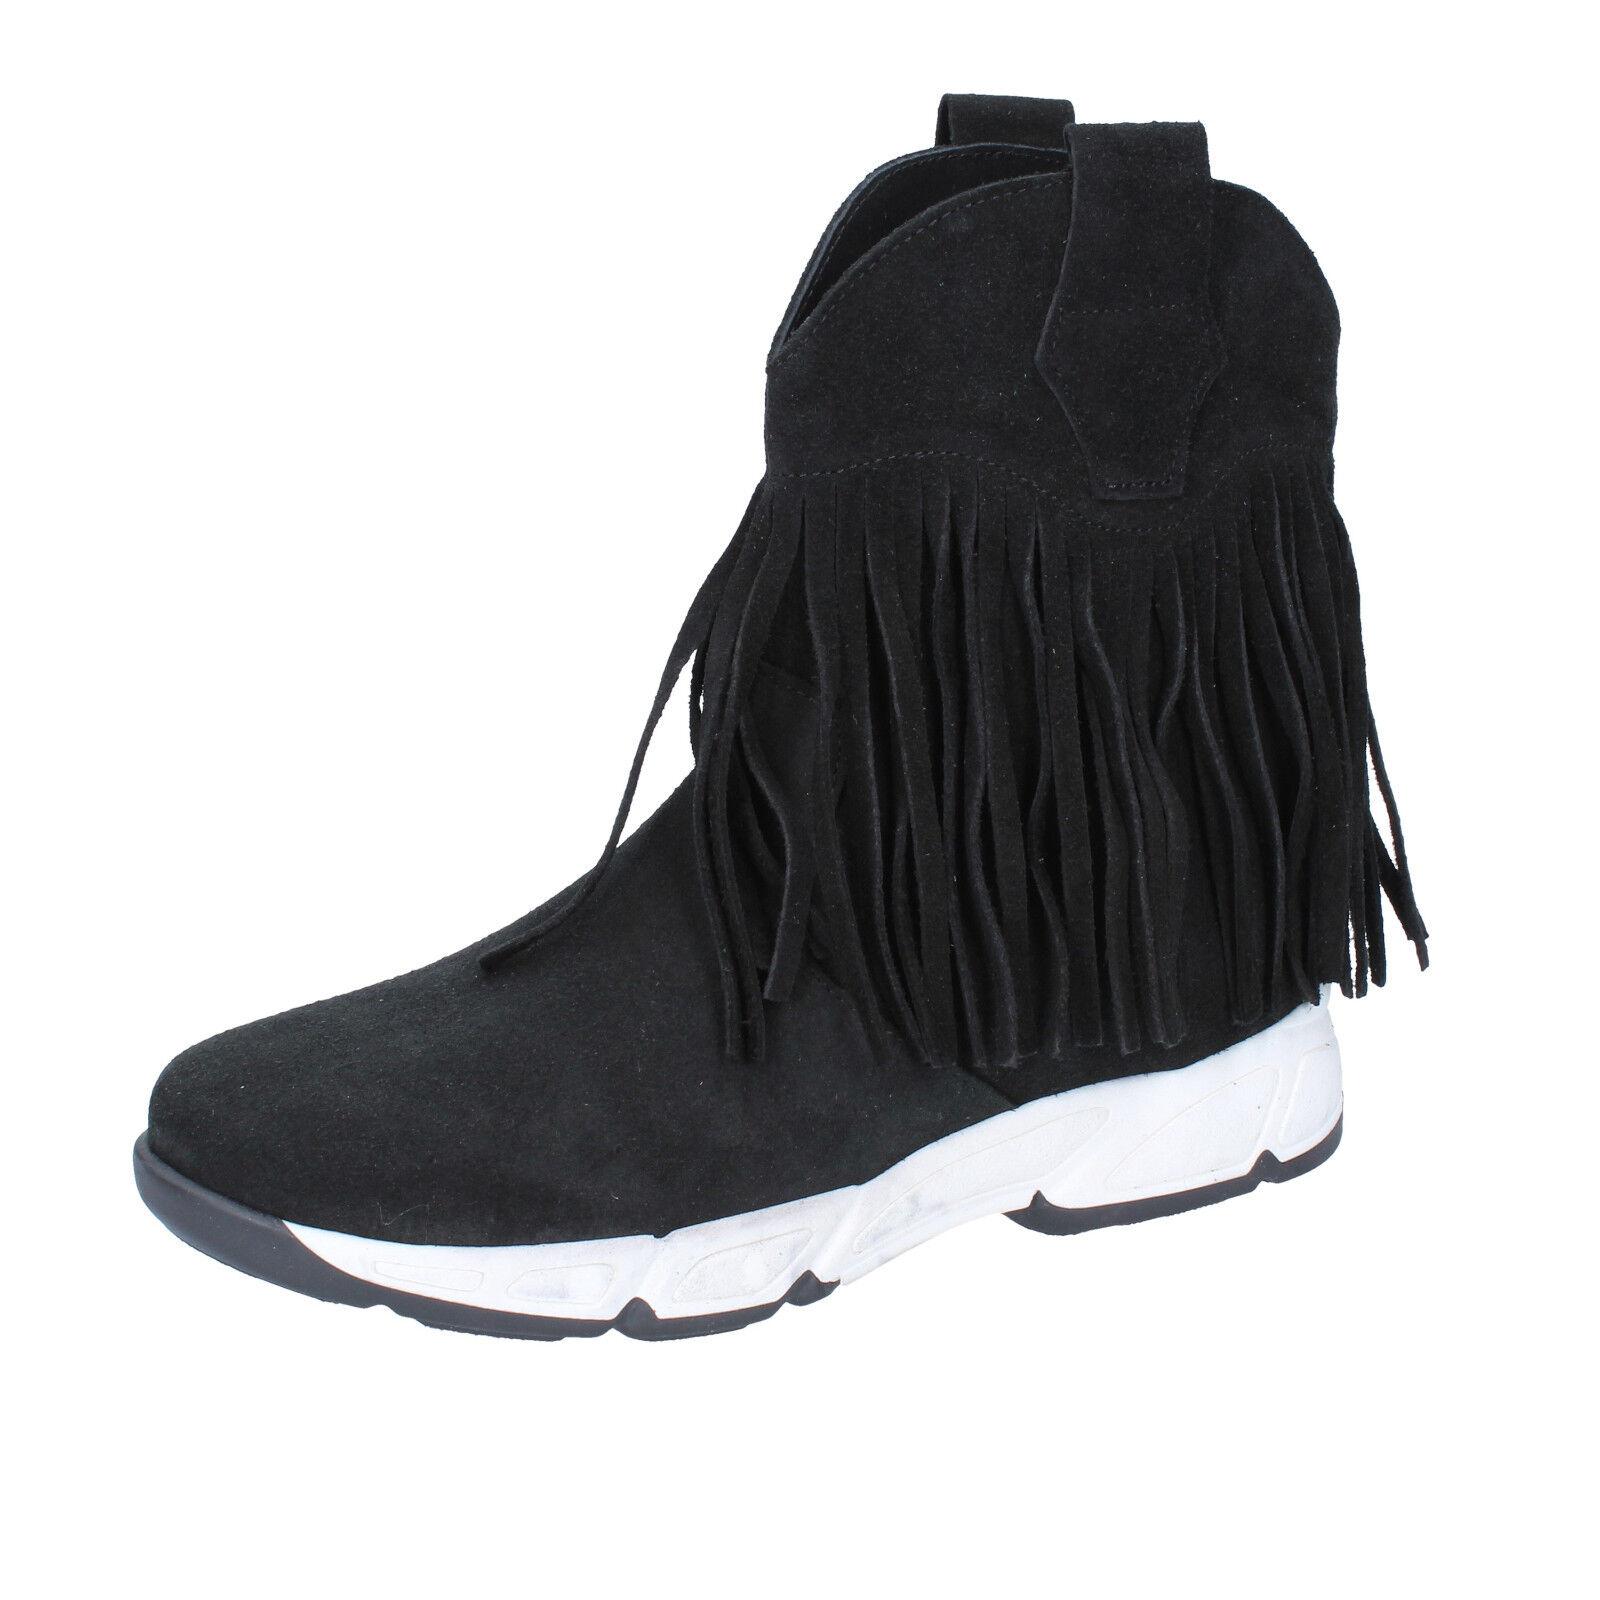 Damens's schuhe OLGA RUBINI 10 (EU 40) ankle boots schwarz suede BX784-40